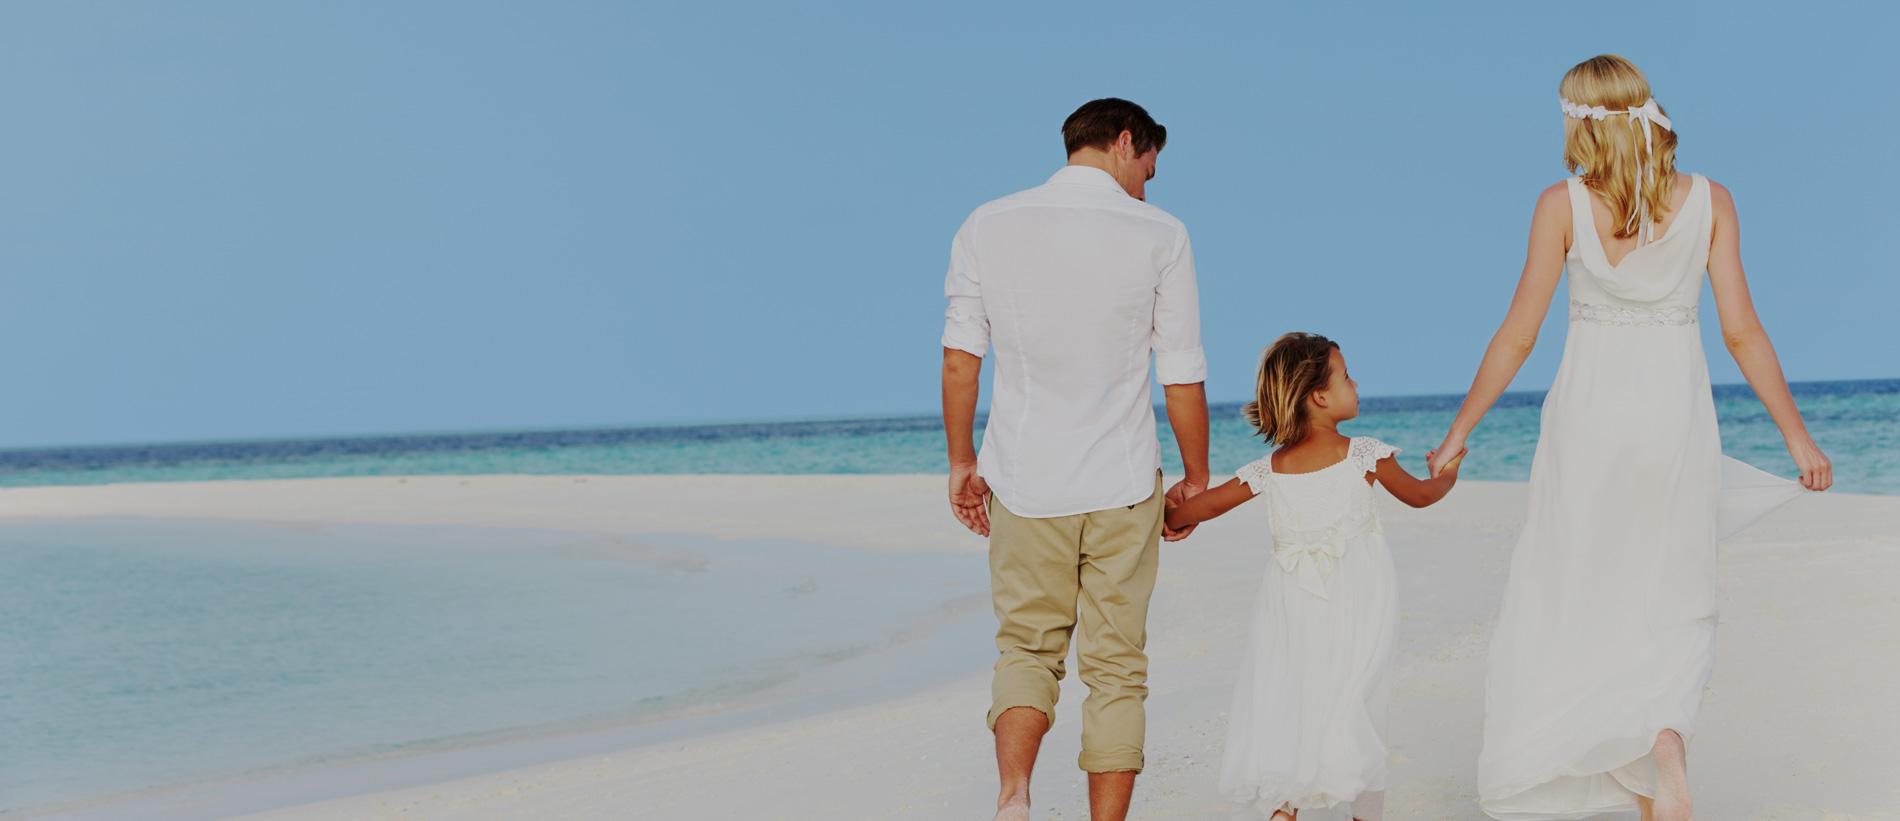 Weddings in Maldives